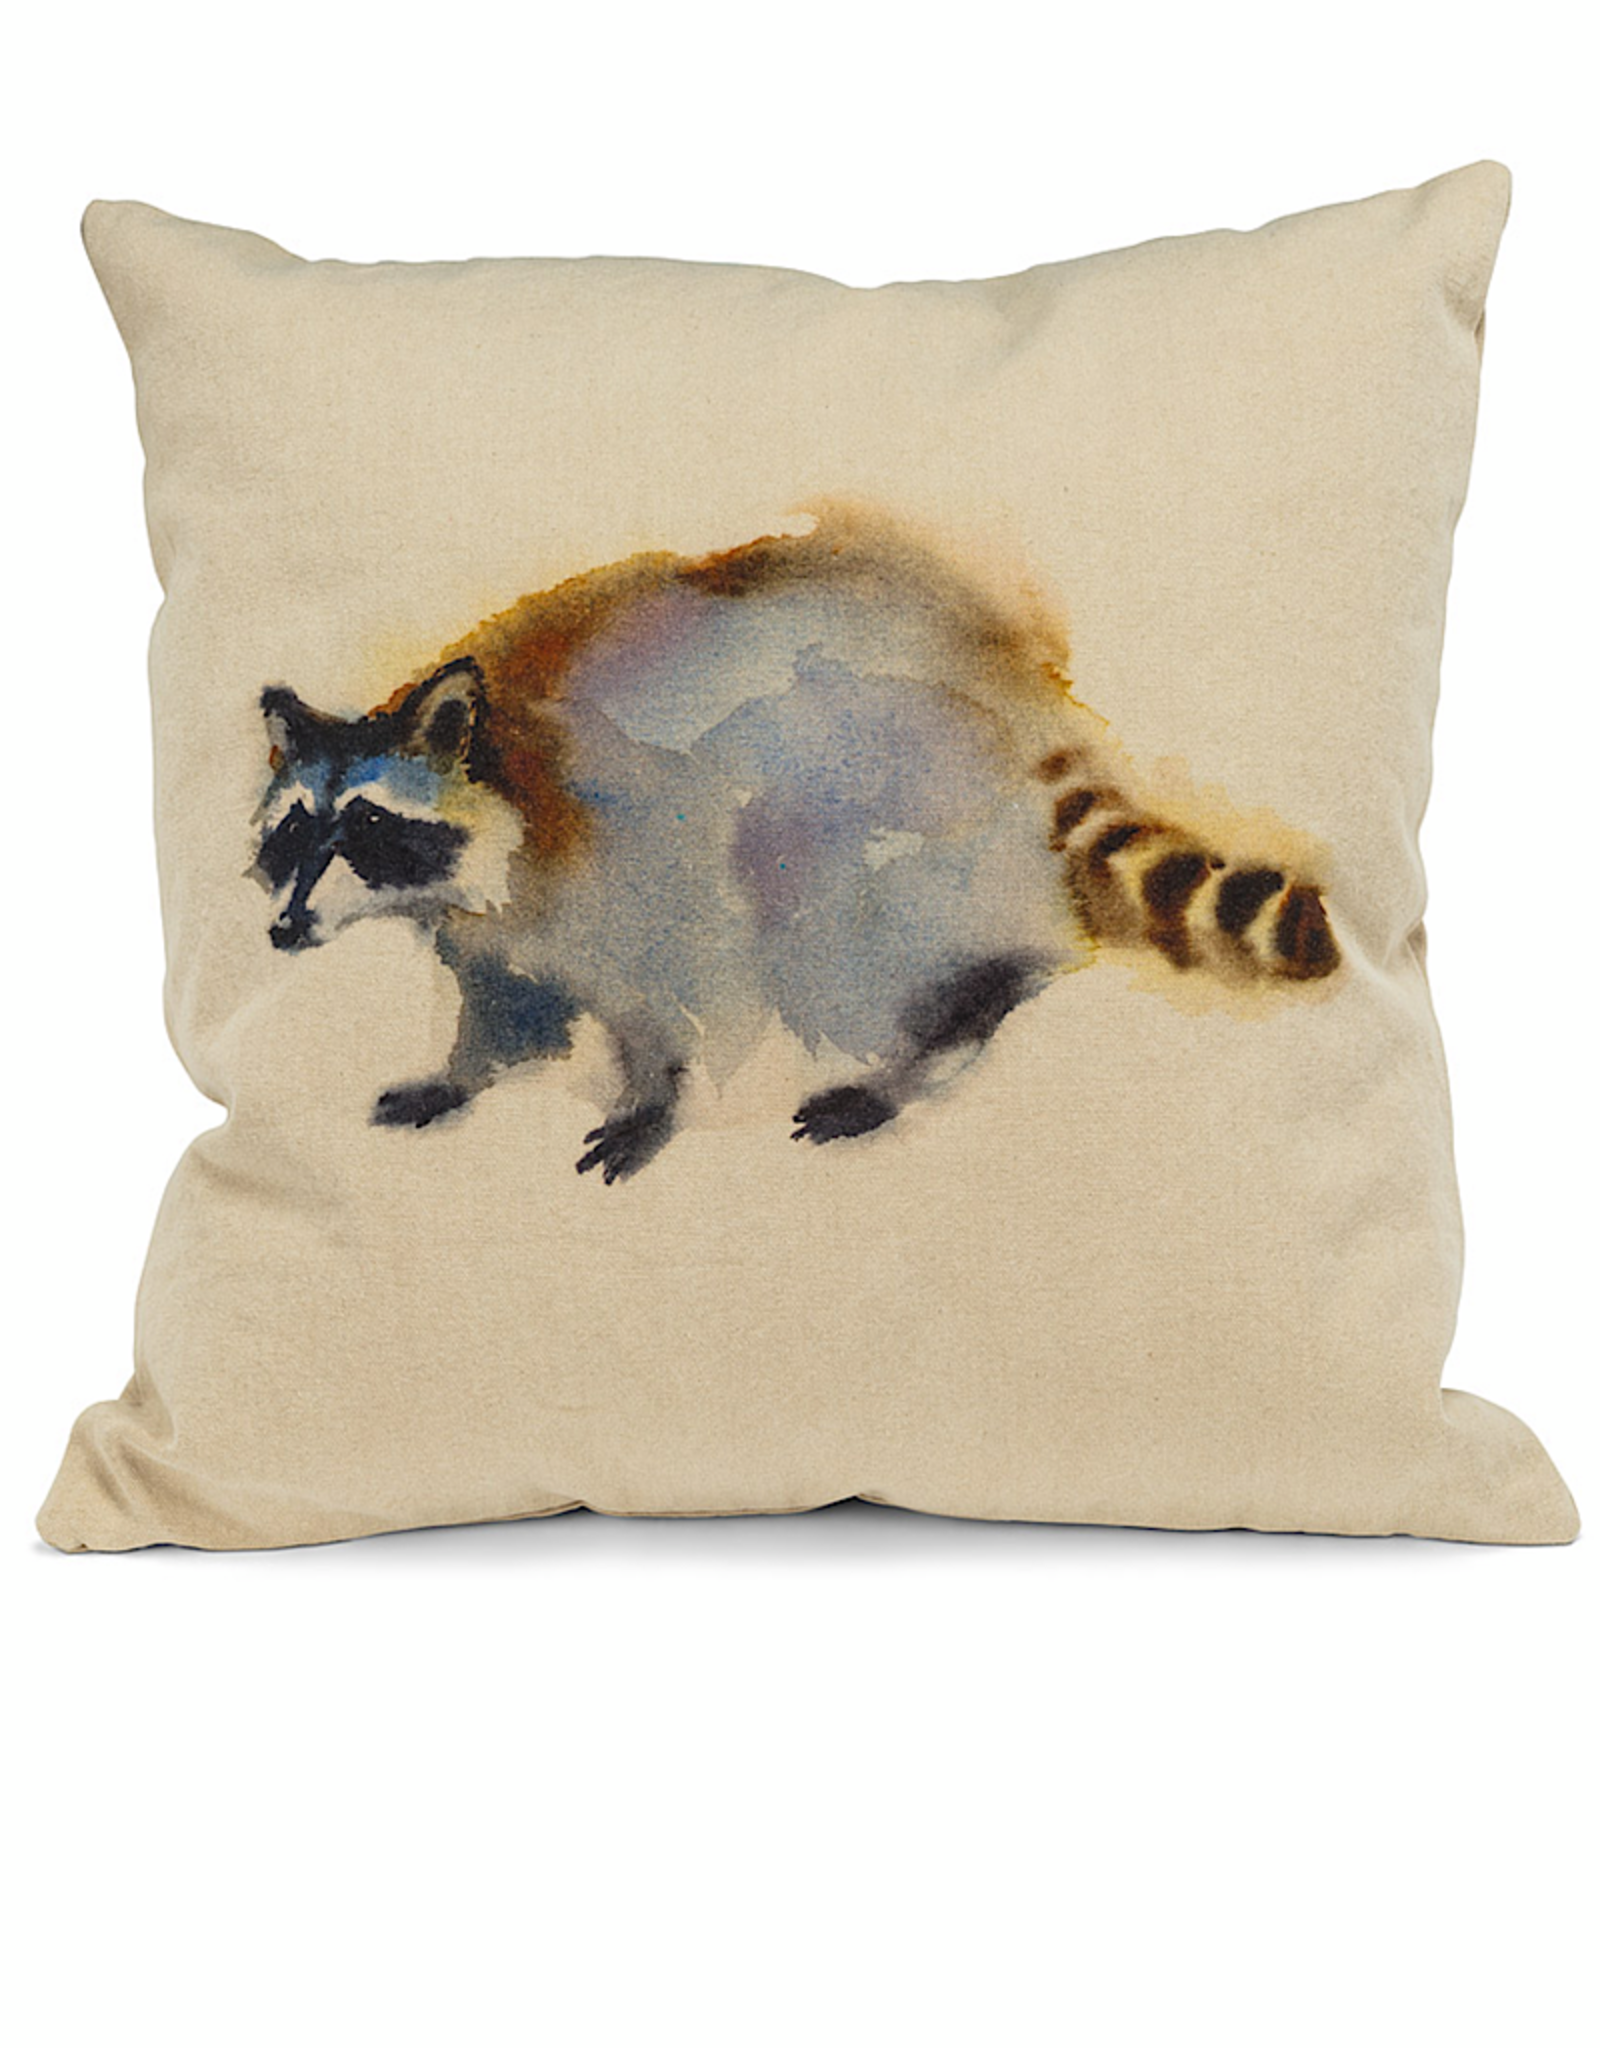 "Raccoon Pillow 18"" Square"